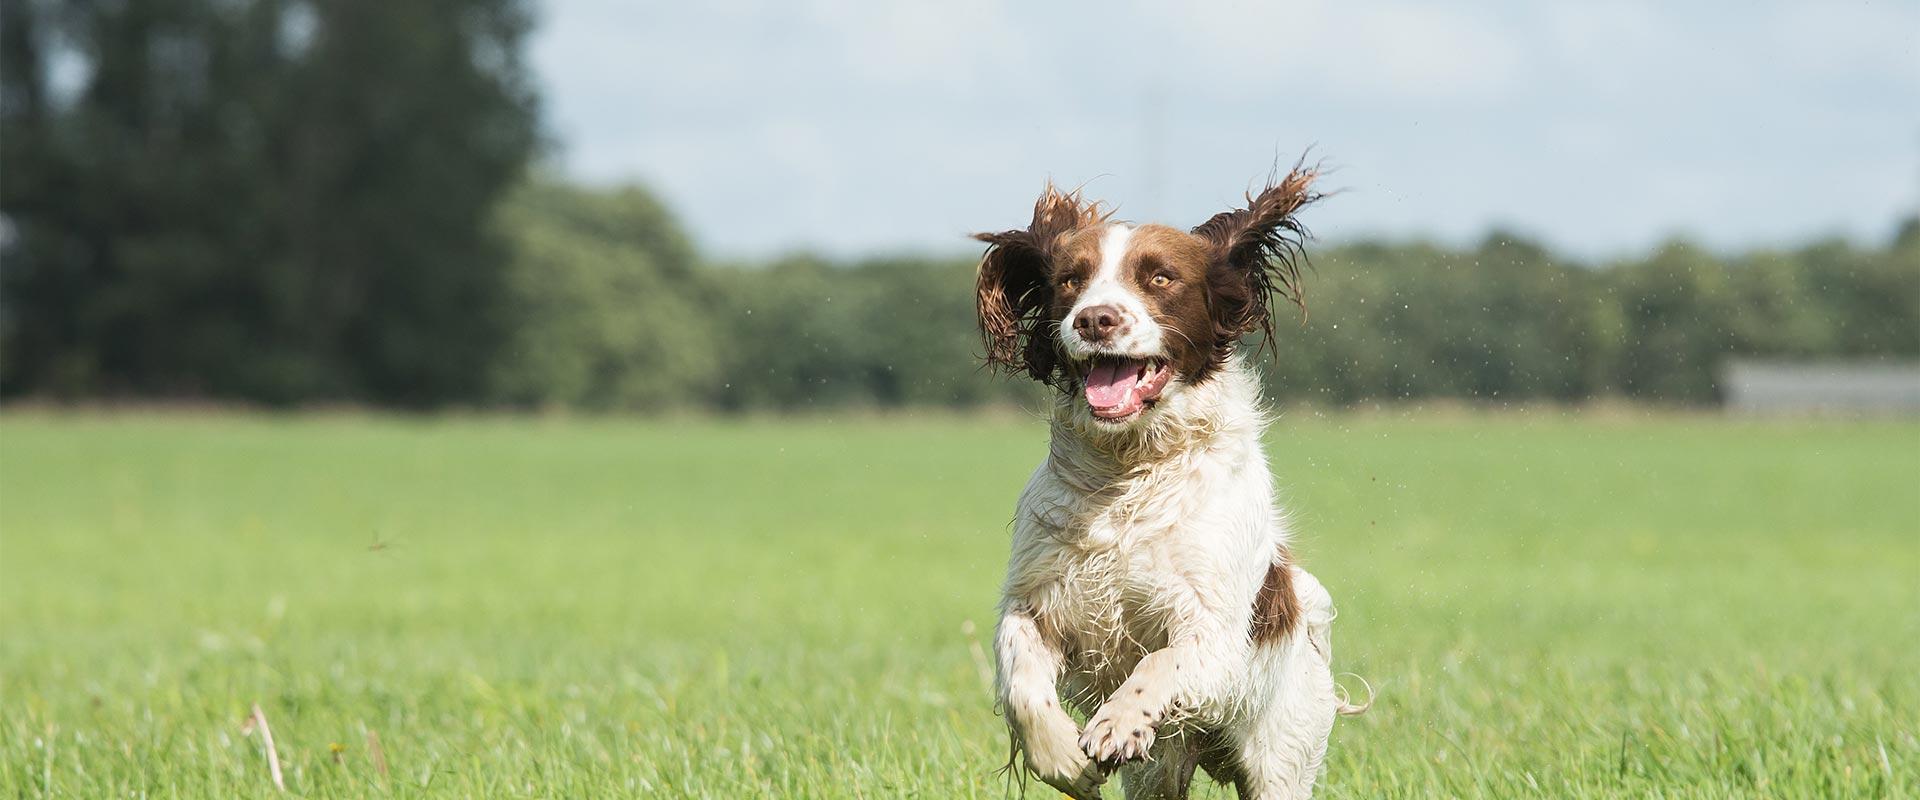 Solo dog walking St Albans - Golden Retreiver